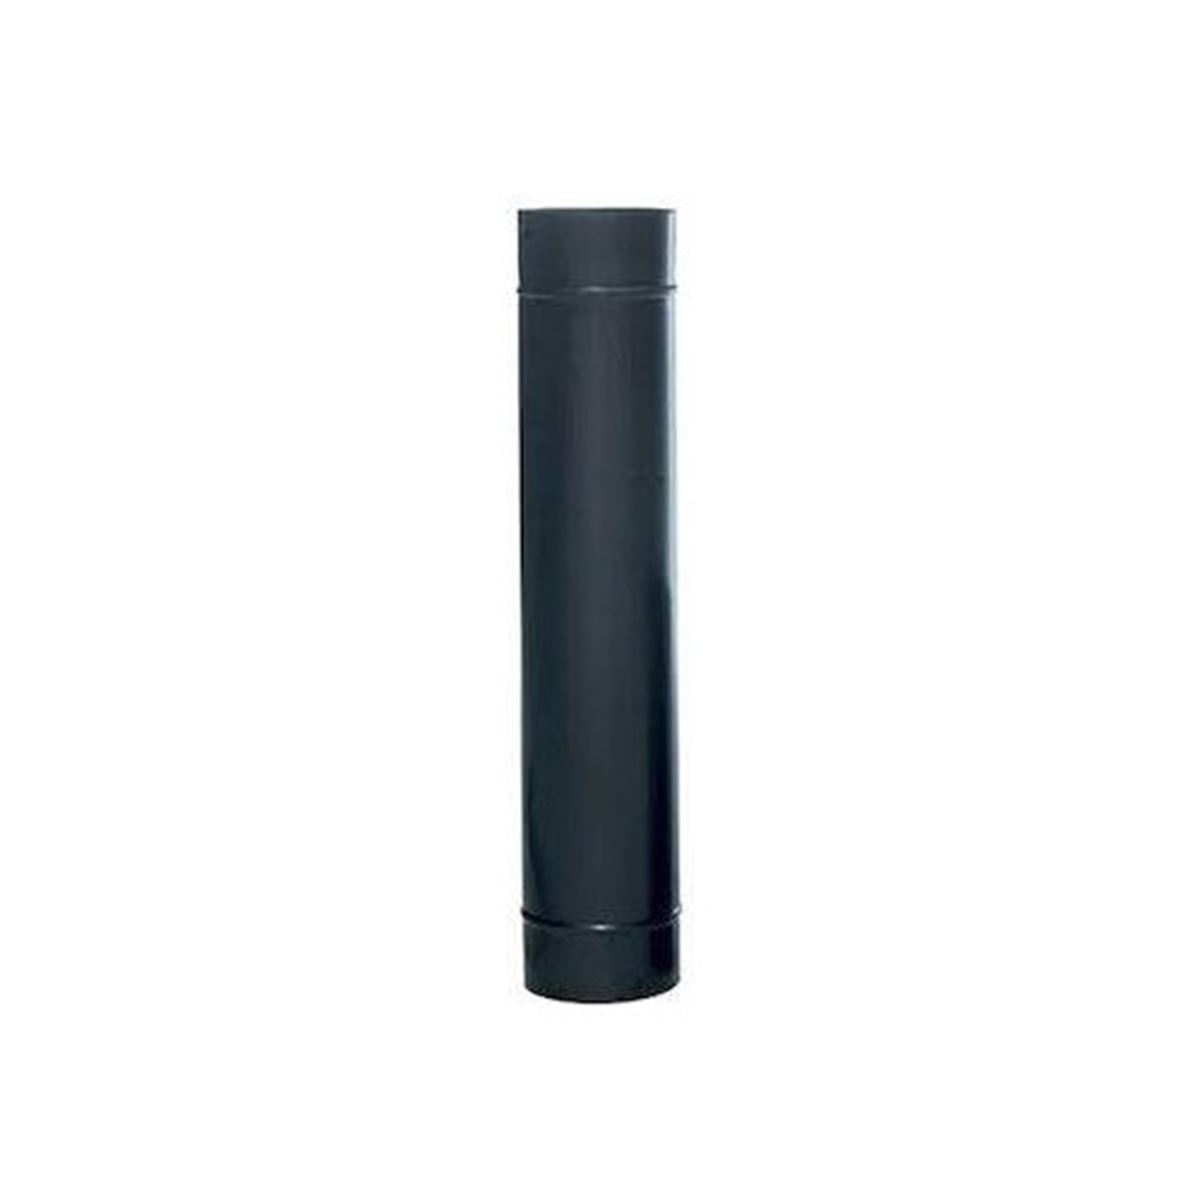 Mat Siyah Soba Borusu 50 Cm Uzunluk